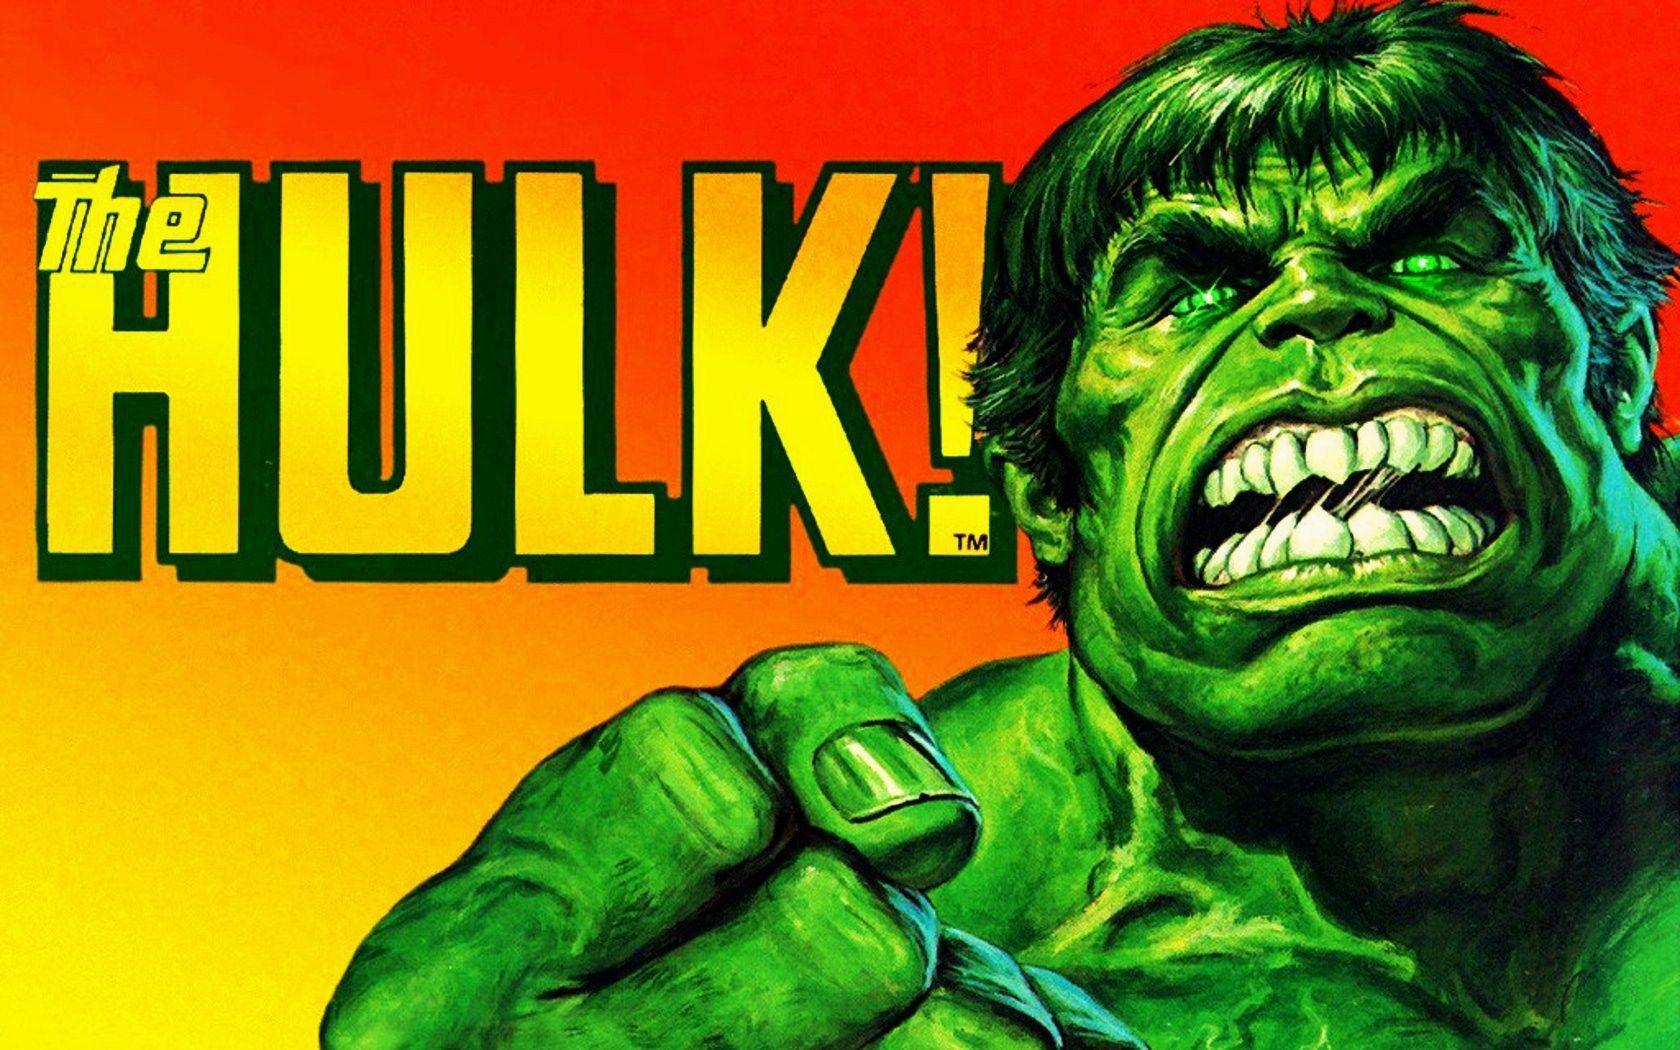 Cool Wallpaper Marvel The Incredible Hulk - 8c037aa3478920637dff5c3e53813965  2018_798663.jpg